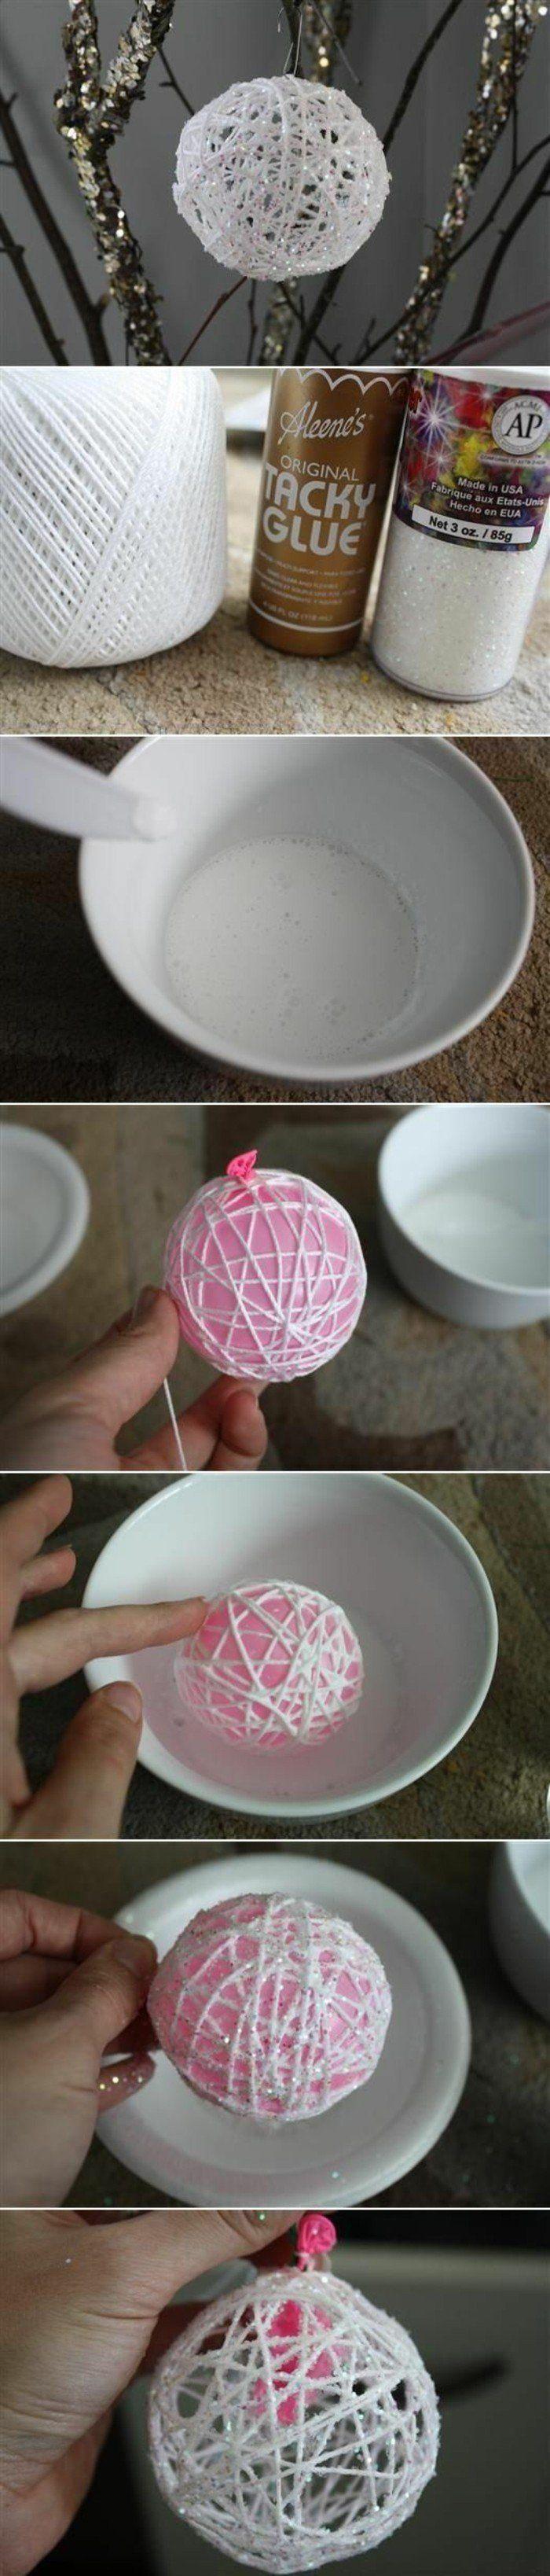 bricolage de noel, boule de Noël en fil en lin